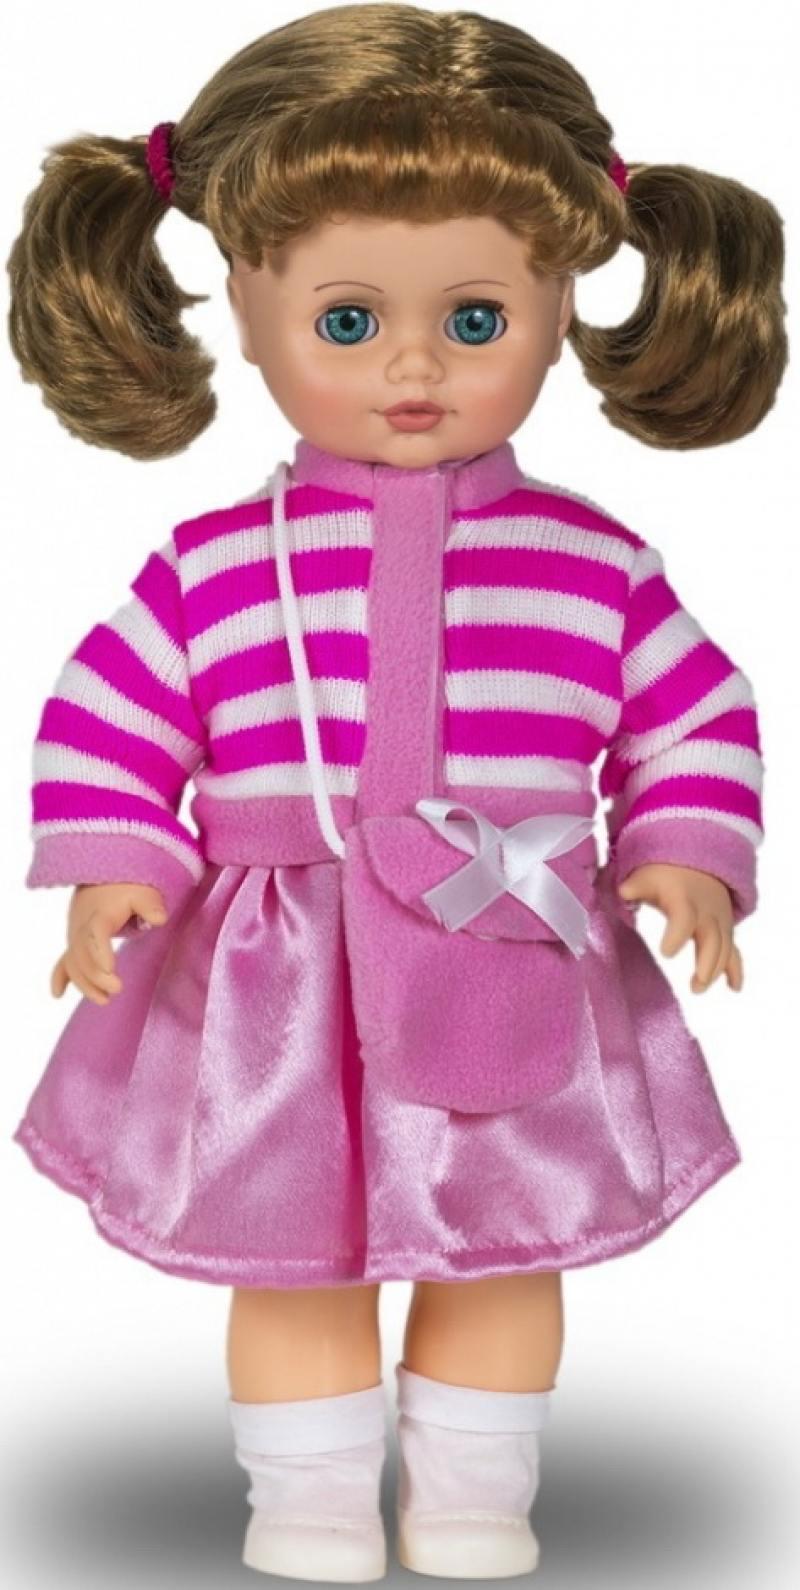 Кукла ВЕСНА Инна 19 (озвученная) В1410/о кукла весна лиза 1 озвученная в35 о